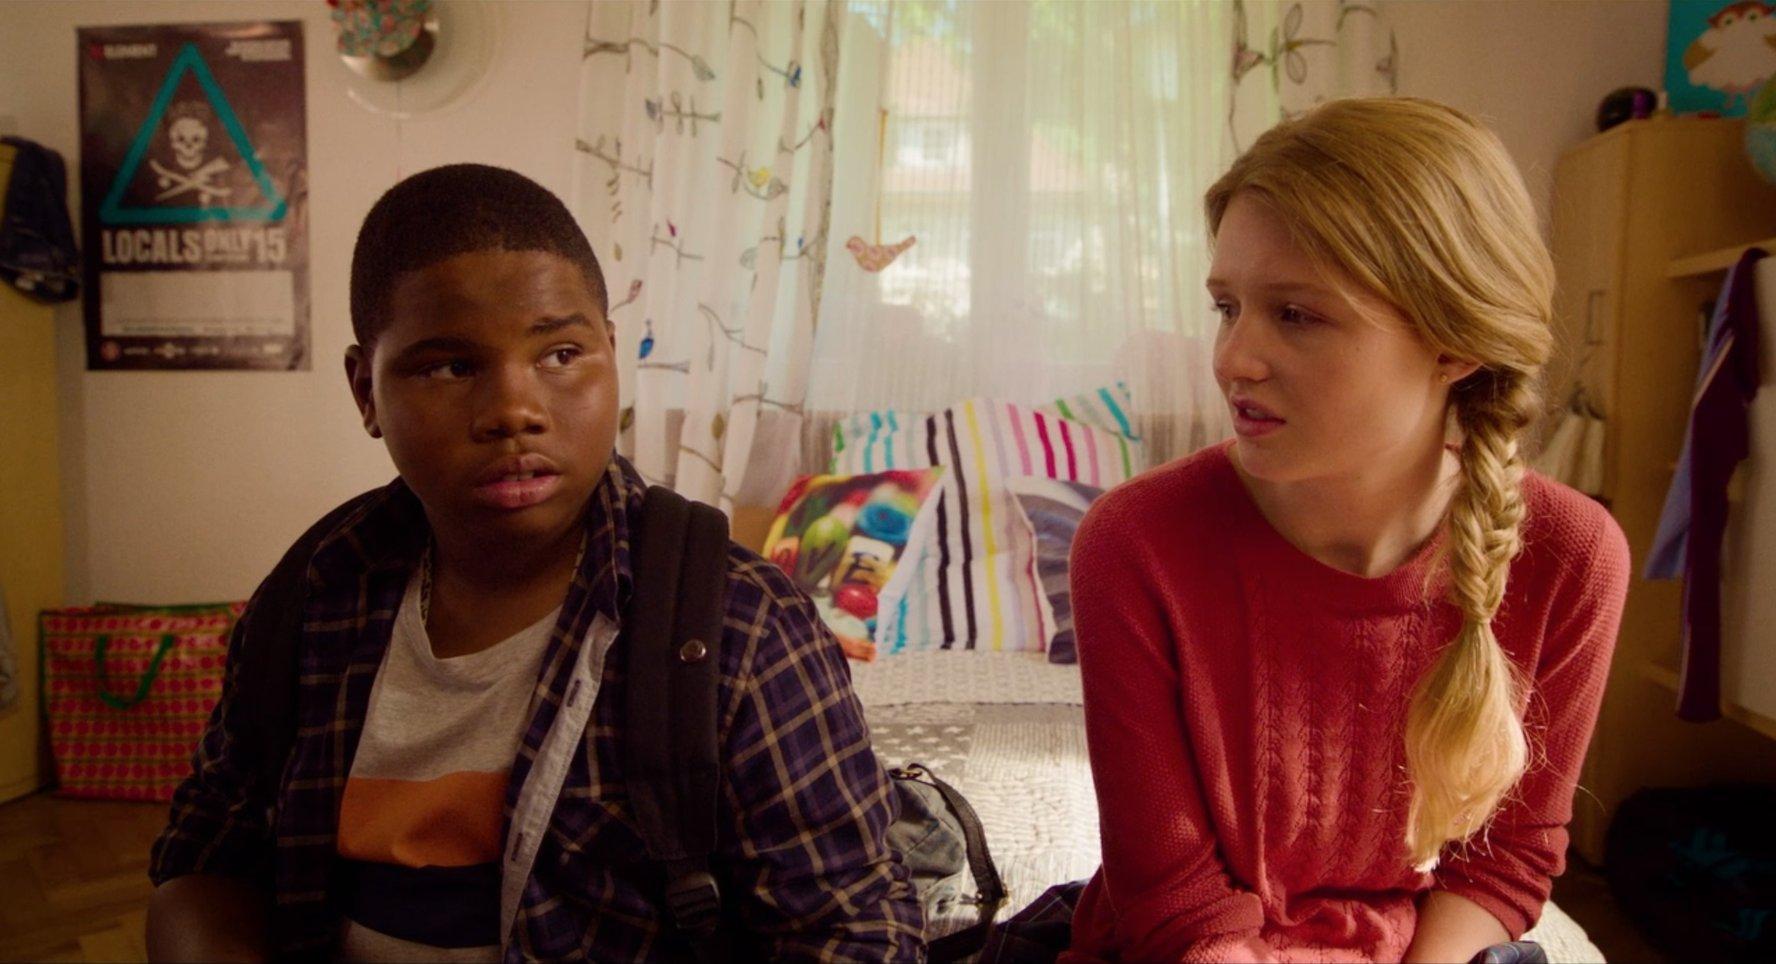 Sundance NEXT FEST Movie Review - 'Morris from America'